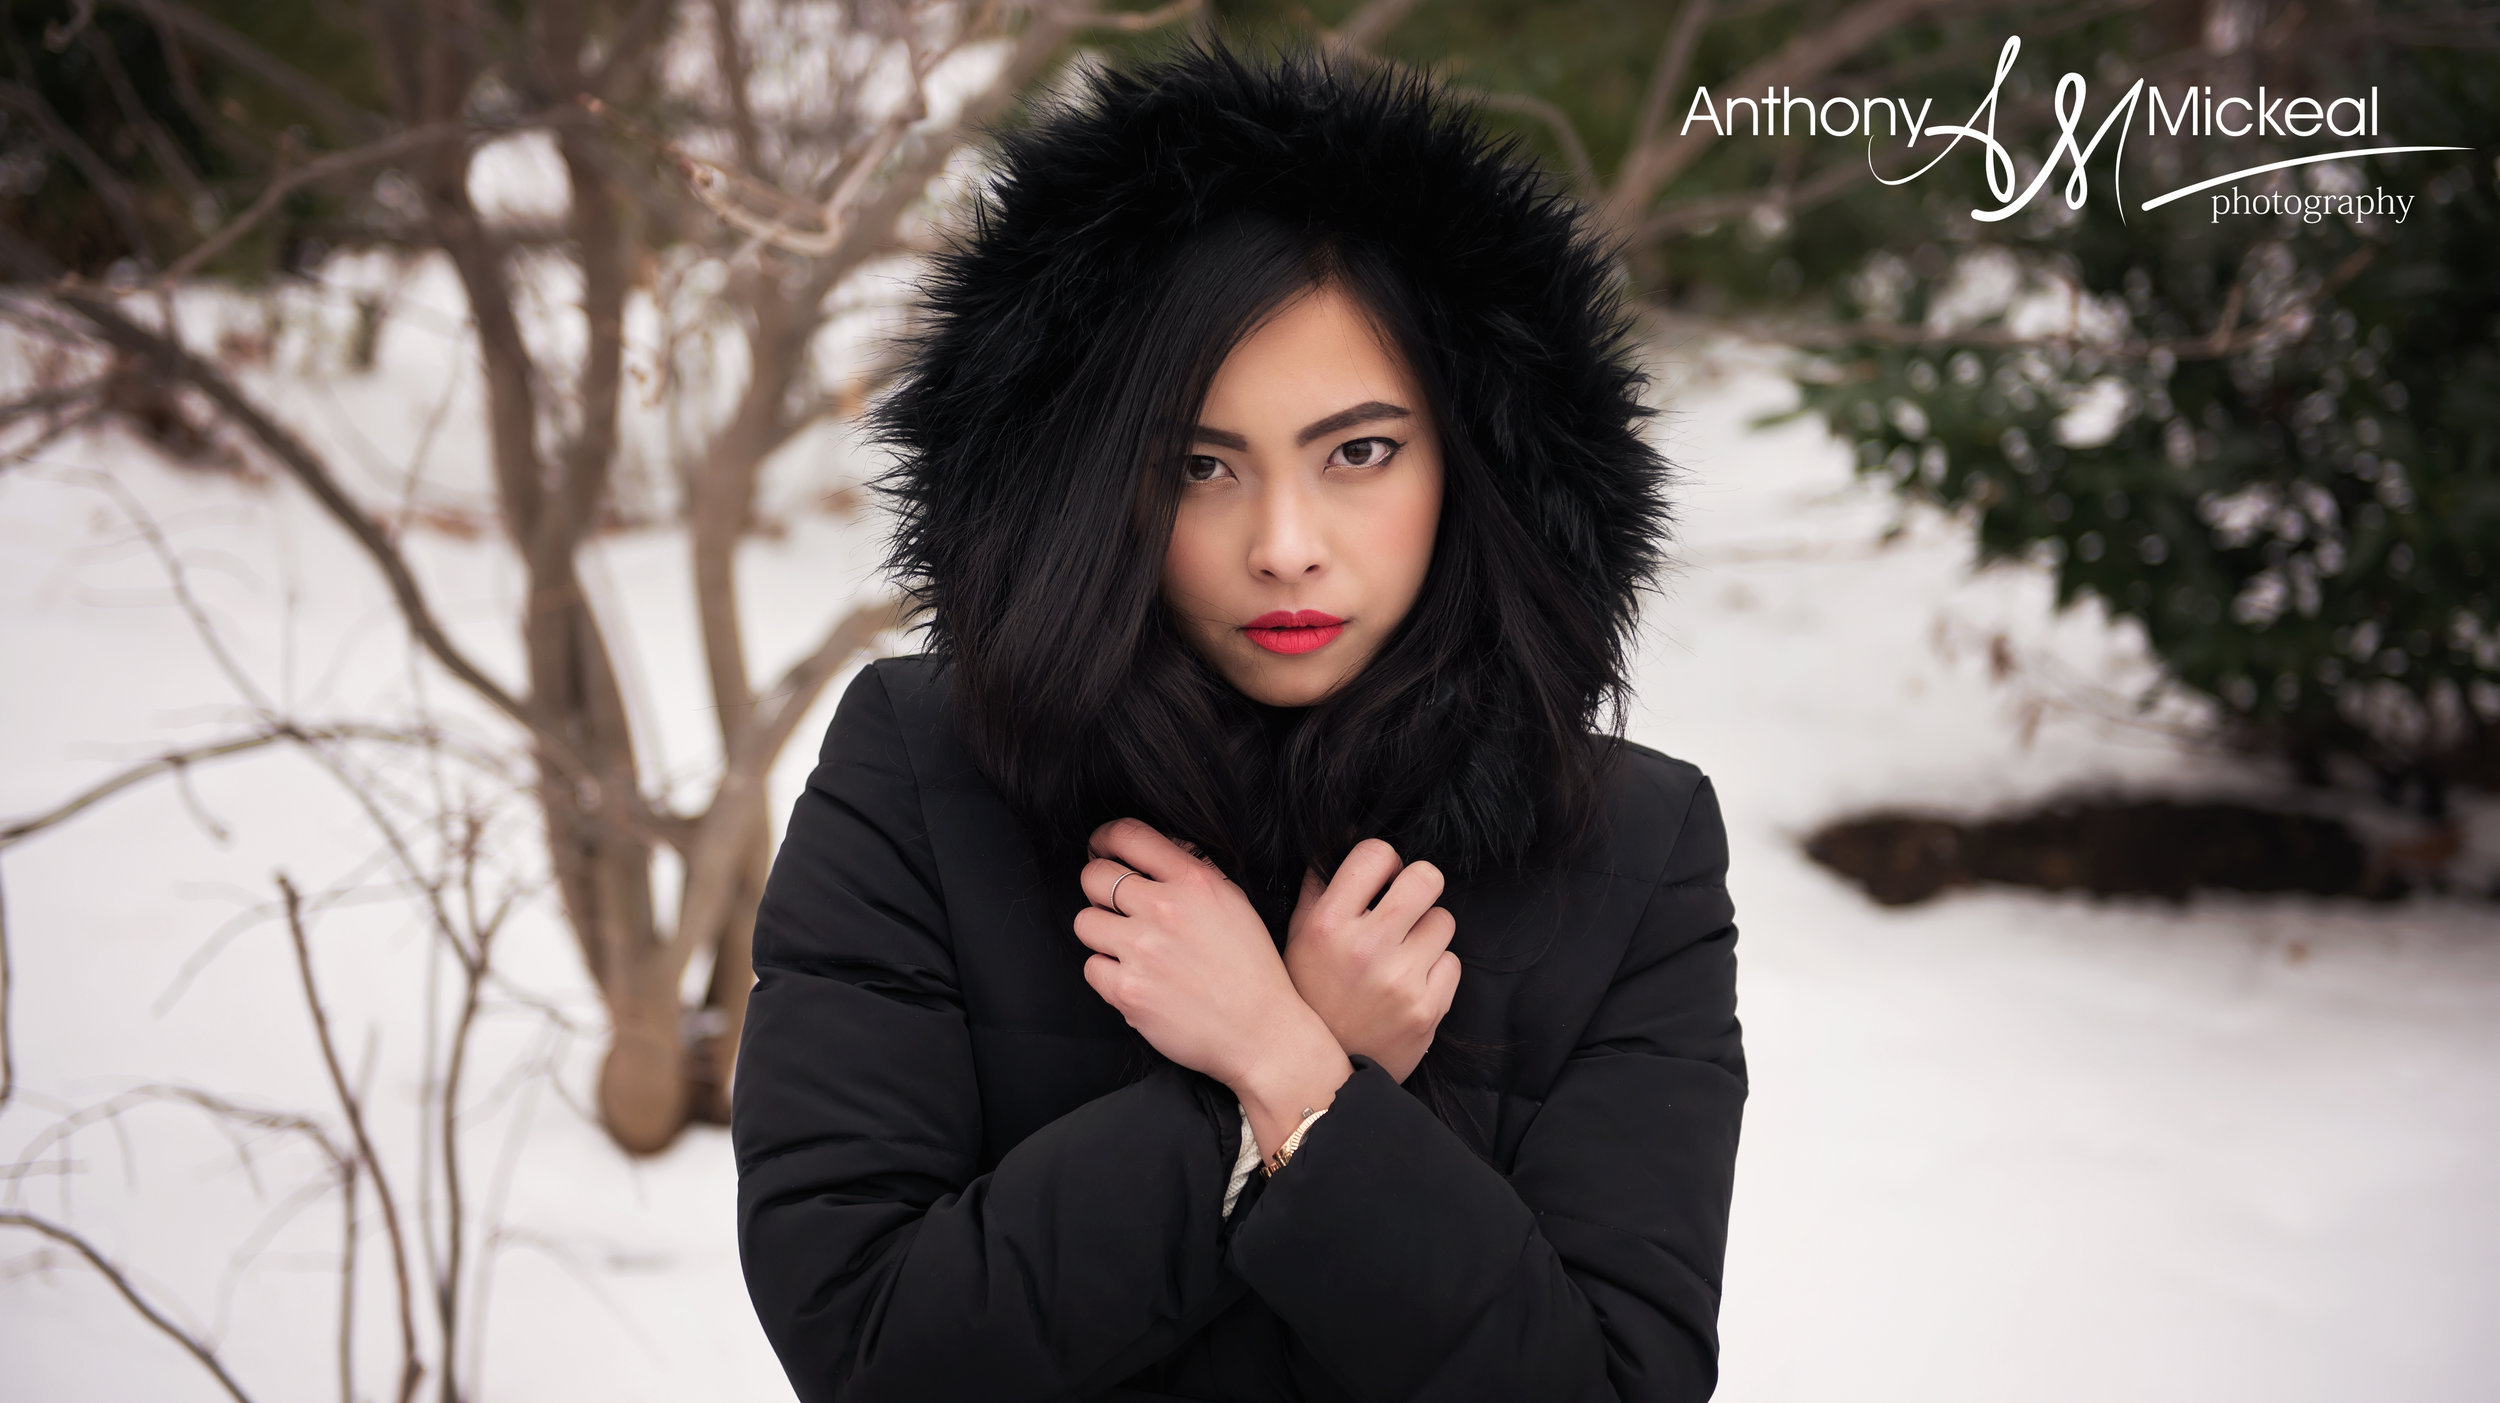 Photoshoot with Japanese Model Mao Hanada at Brooklyn Bridge